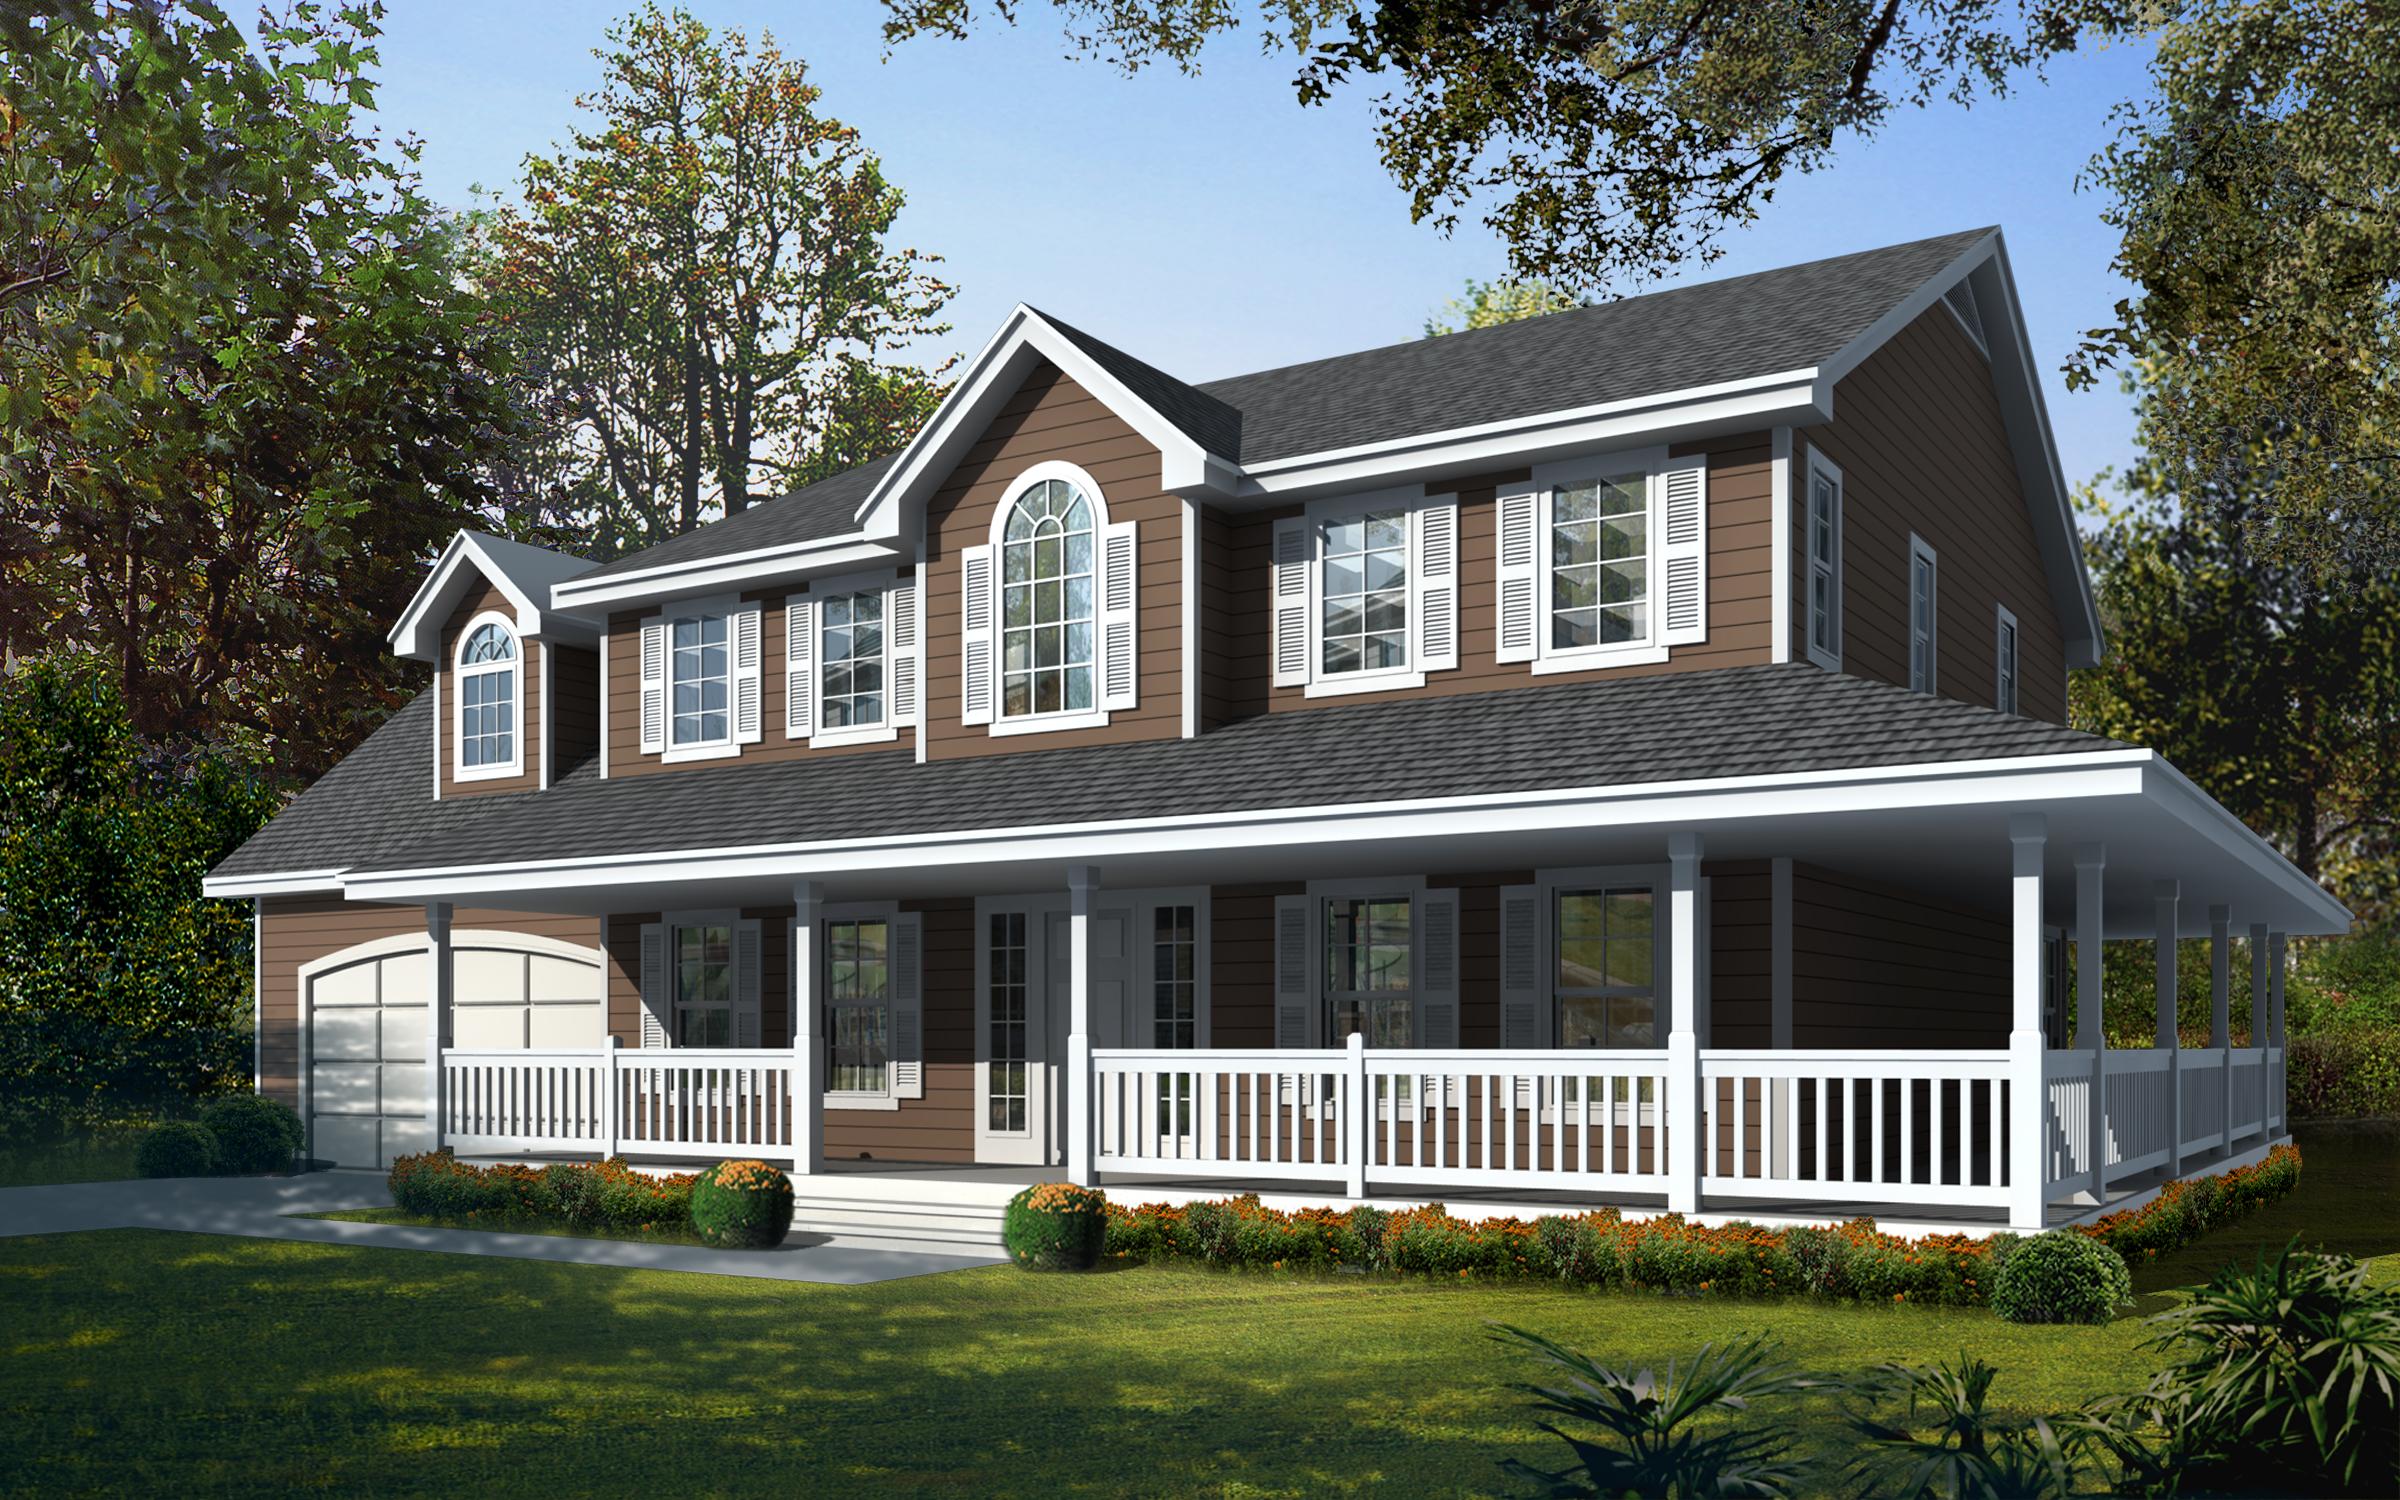 Wrap around porch 14049dt architectural designs for Wrap around porch home plans